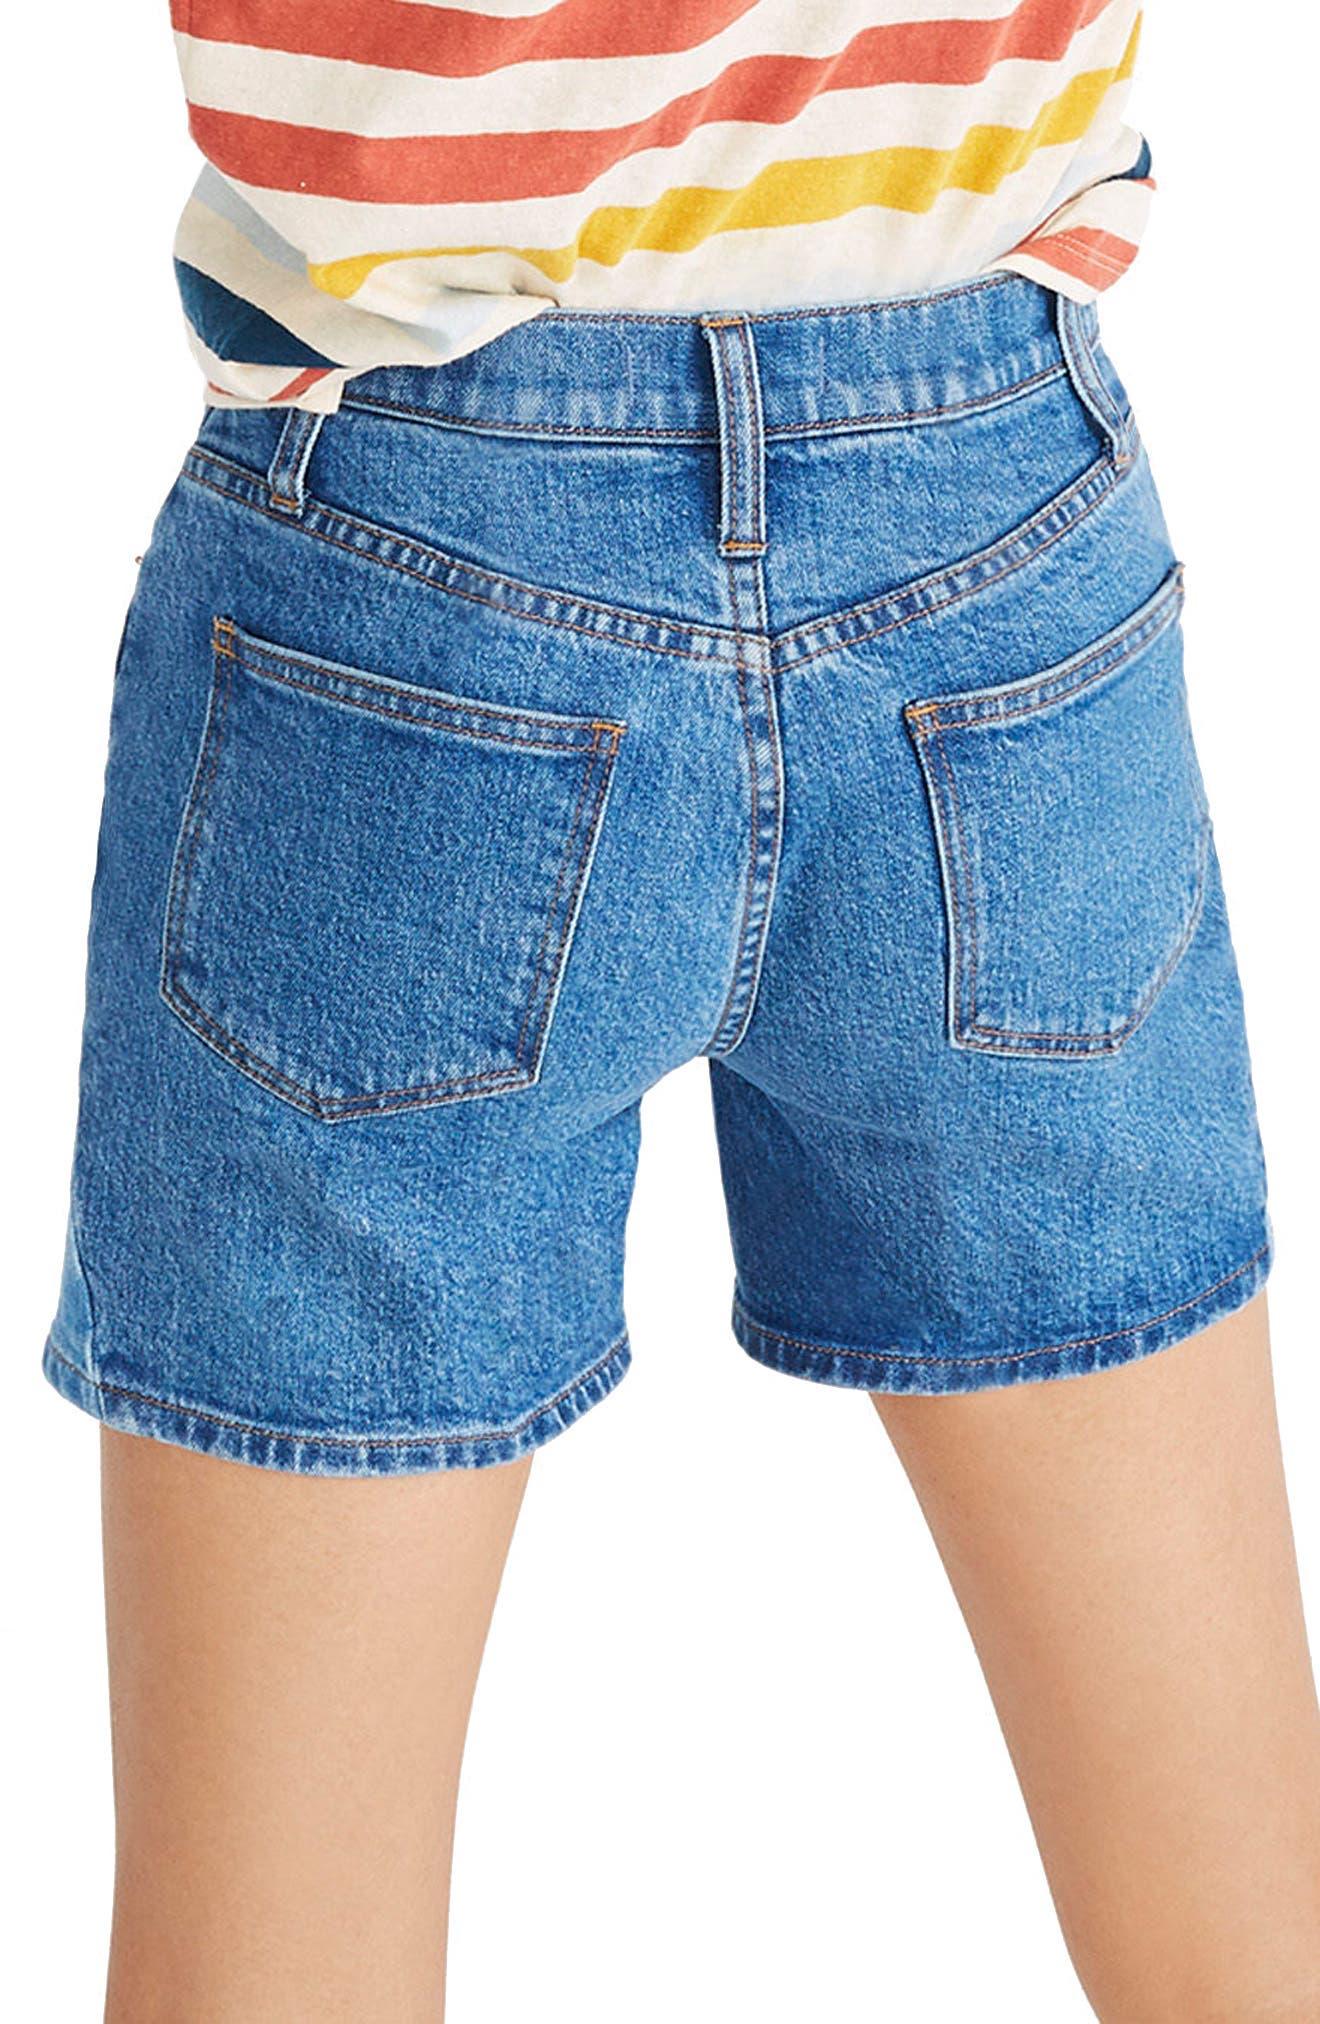 High Waist Pieced Denim Shorts,                             Alternate thumbnail 2, color,                             400